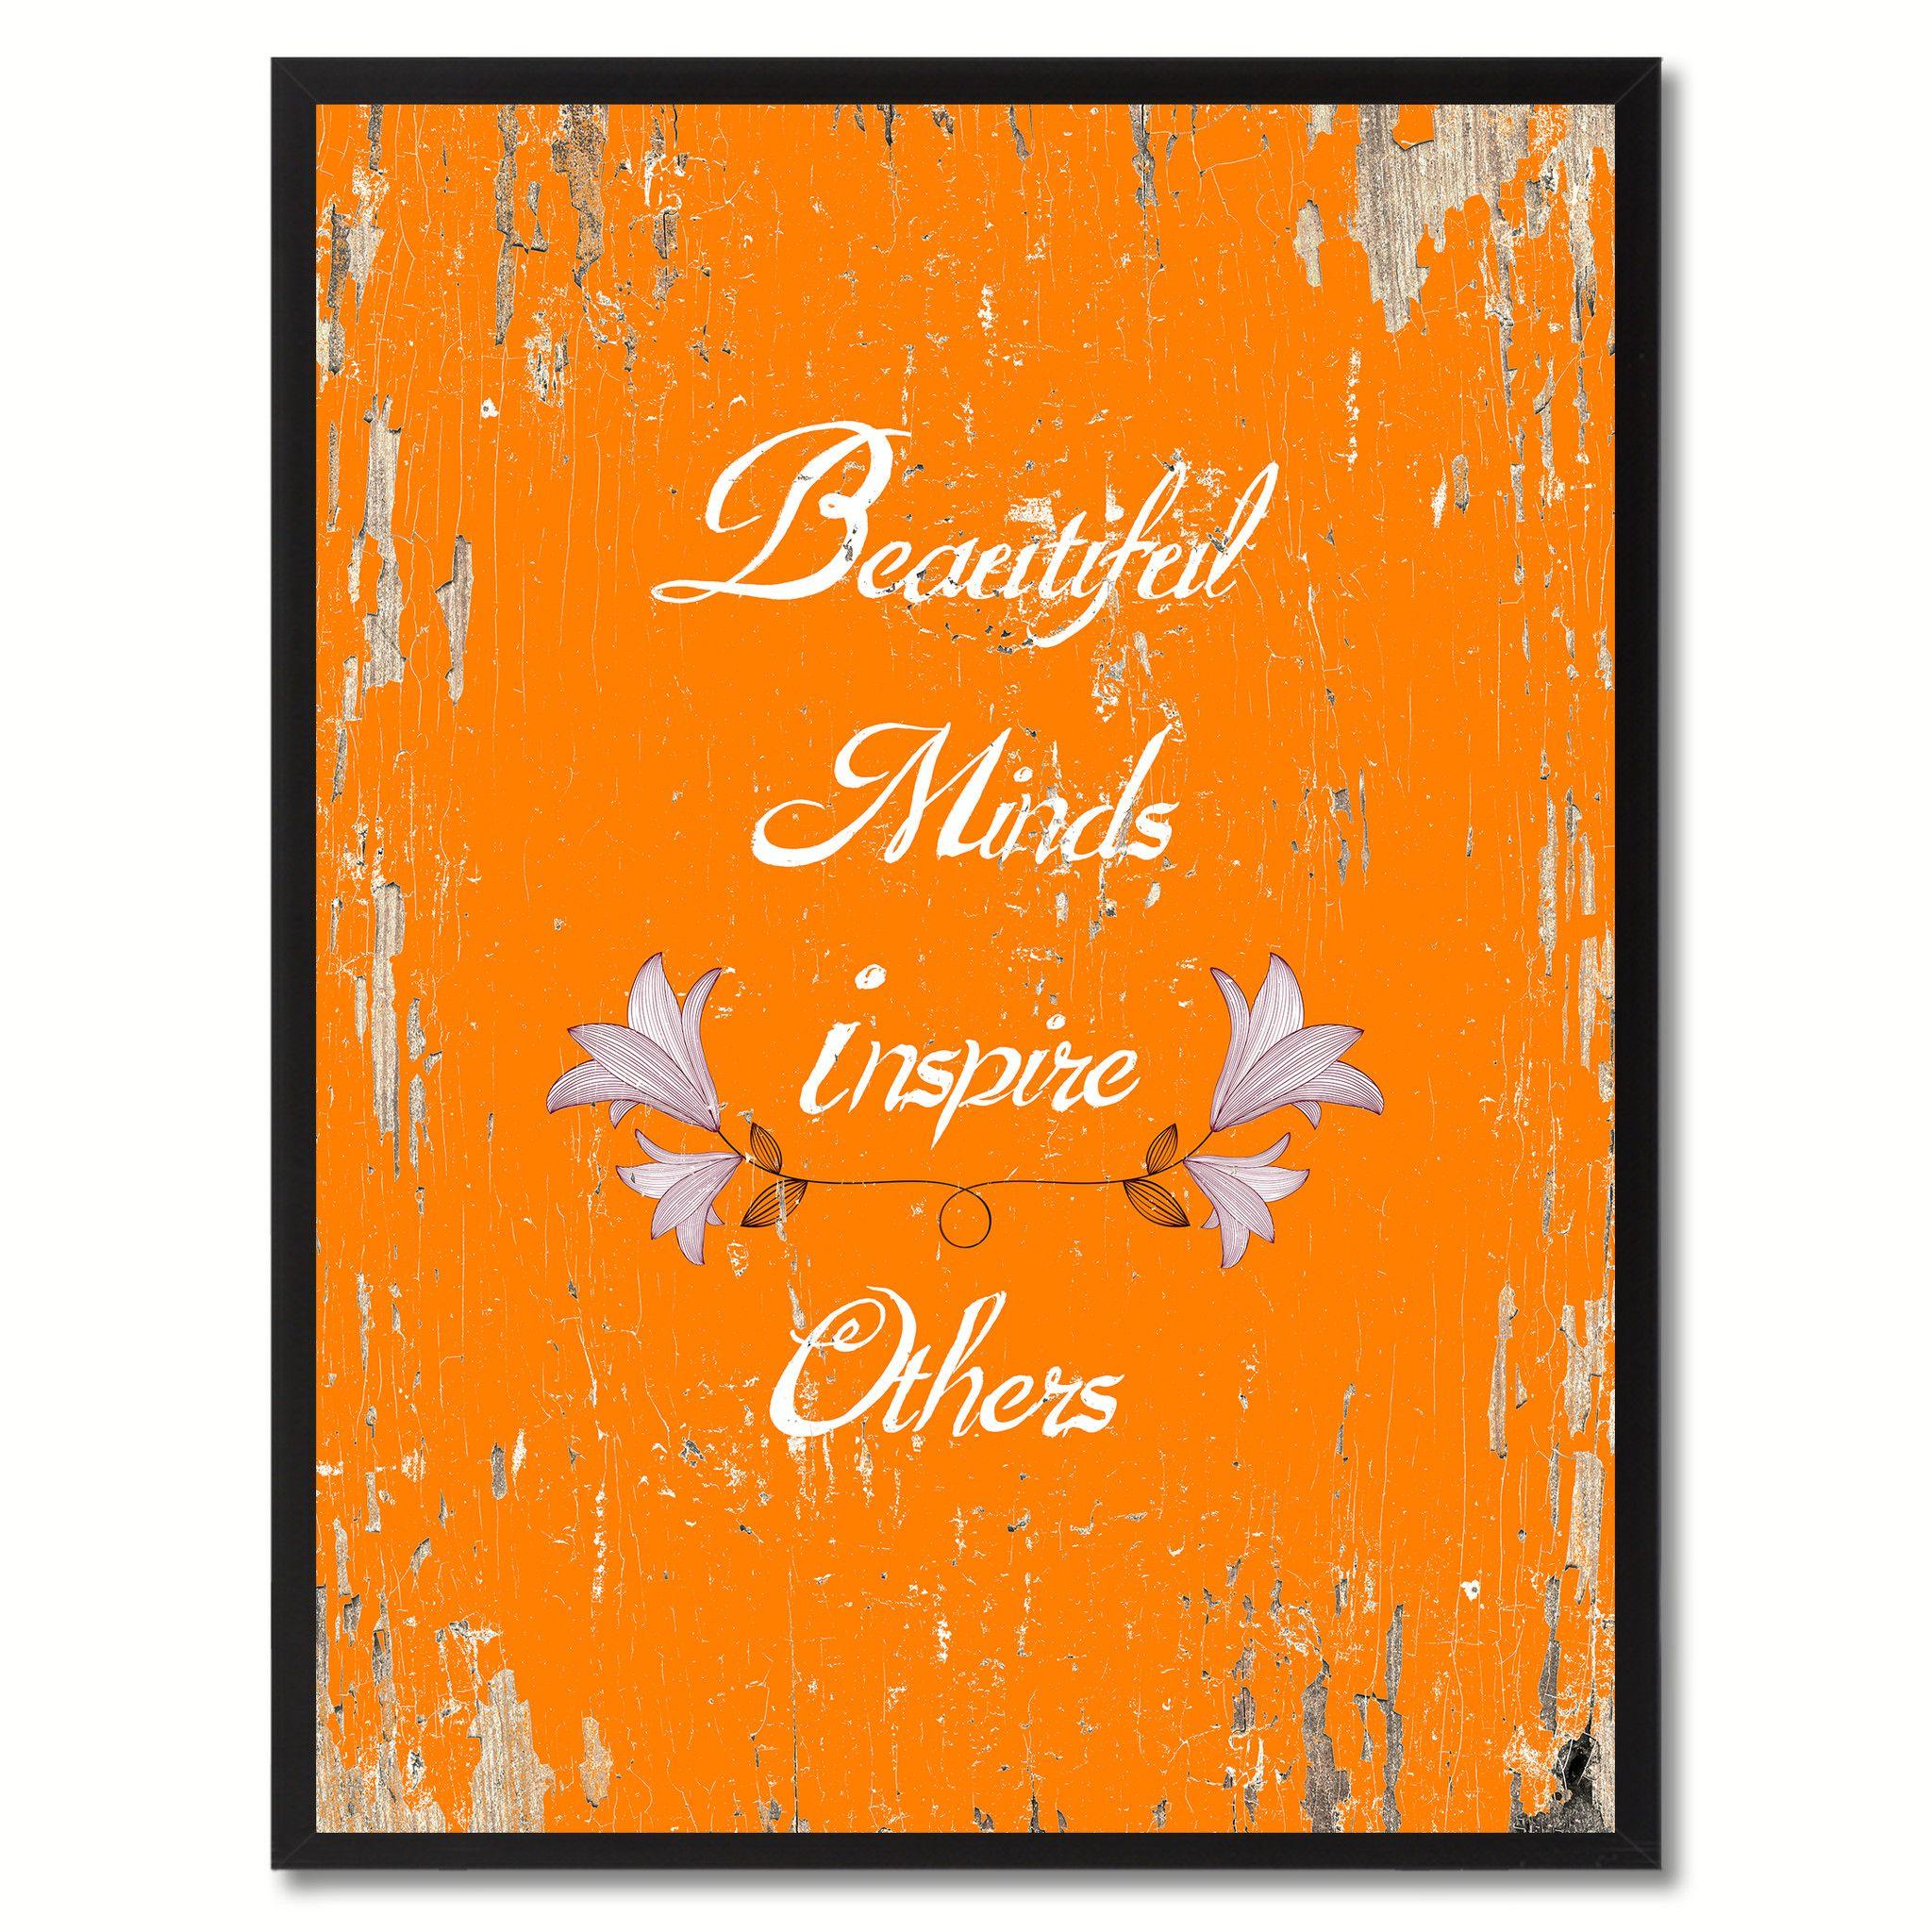 Beautiful minds inspire others inspirational saying